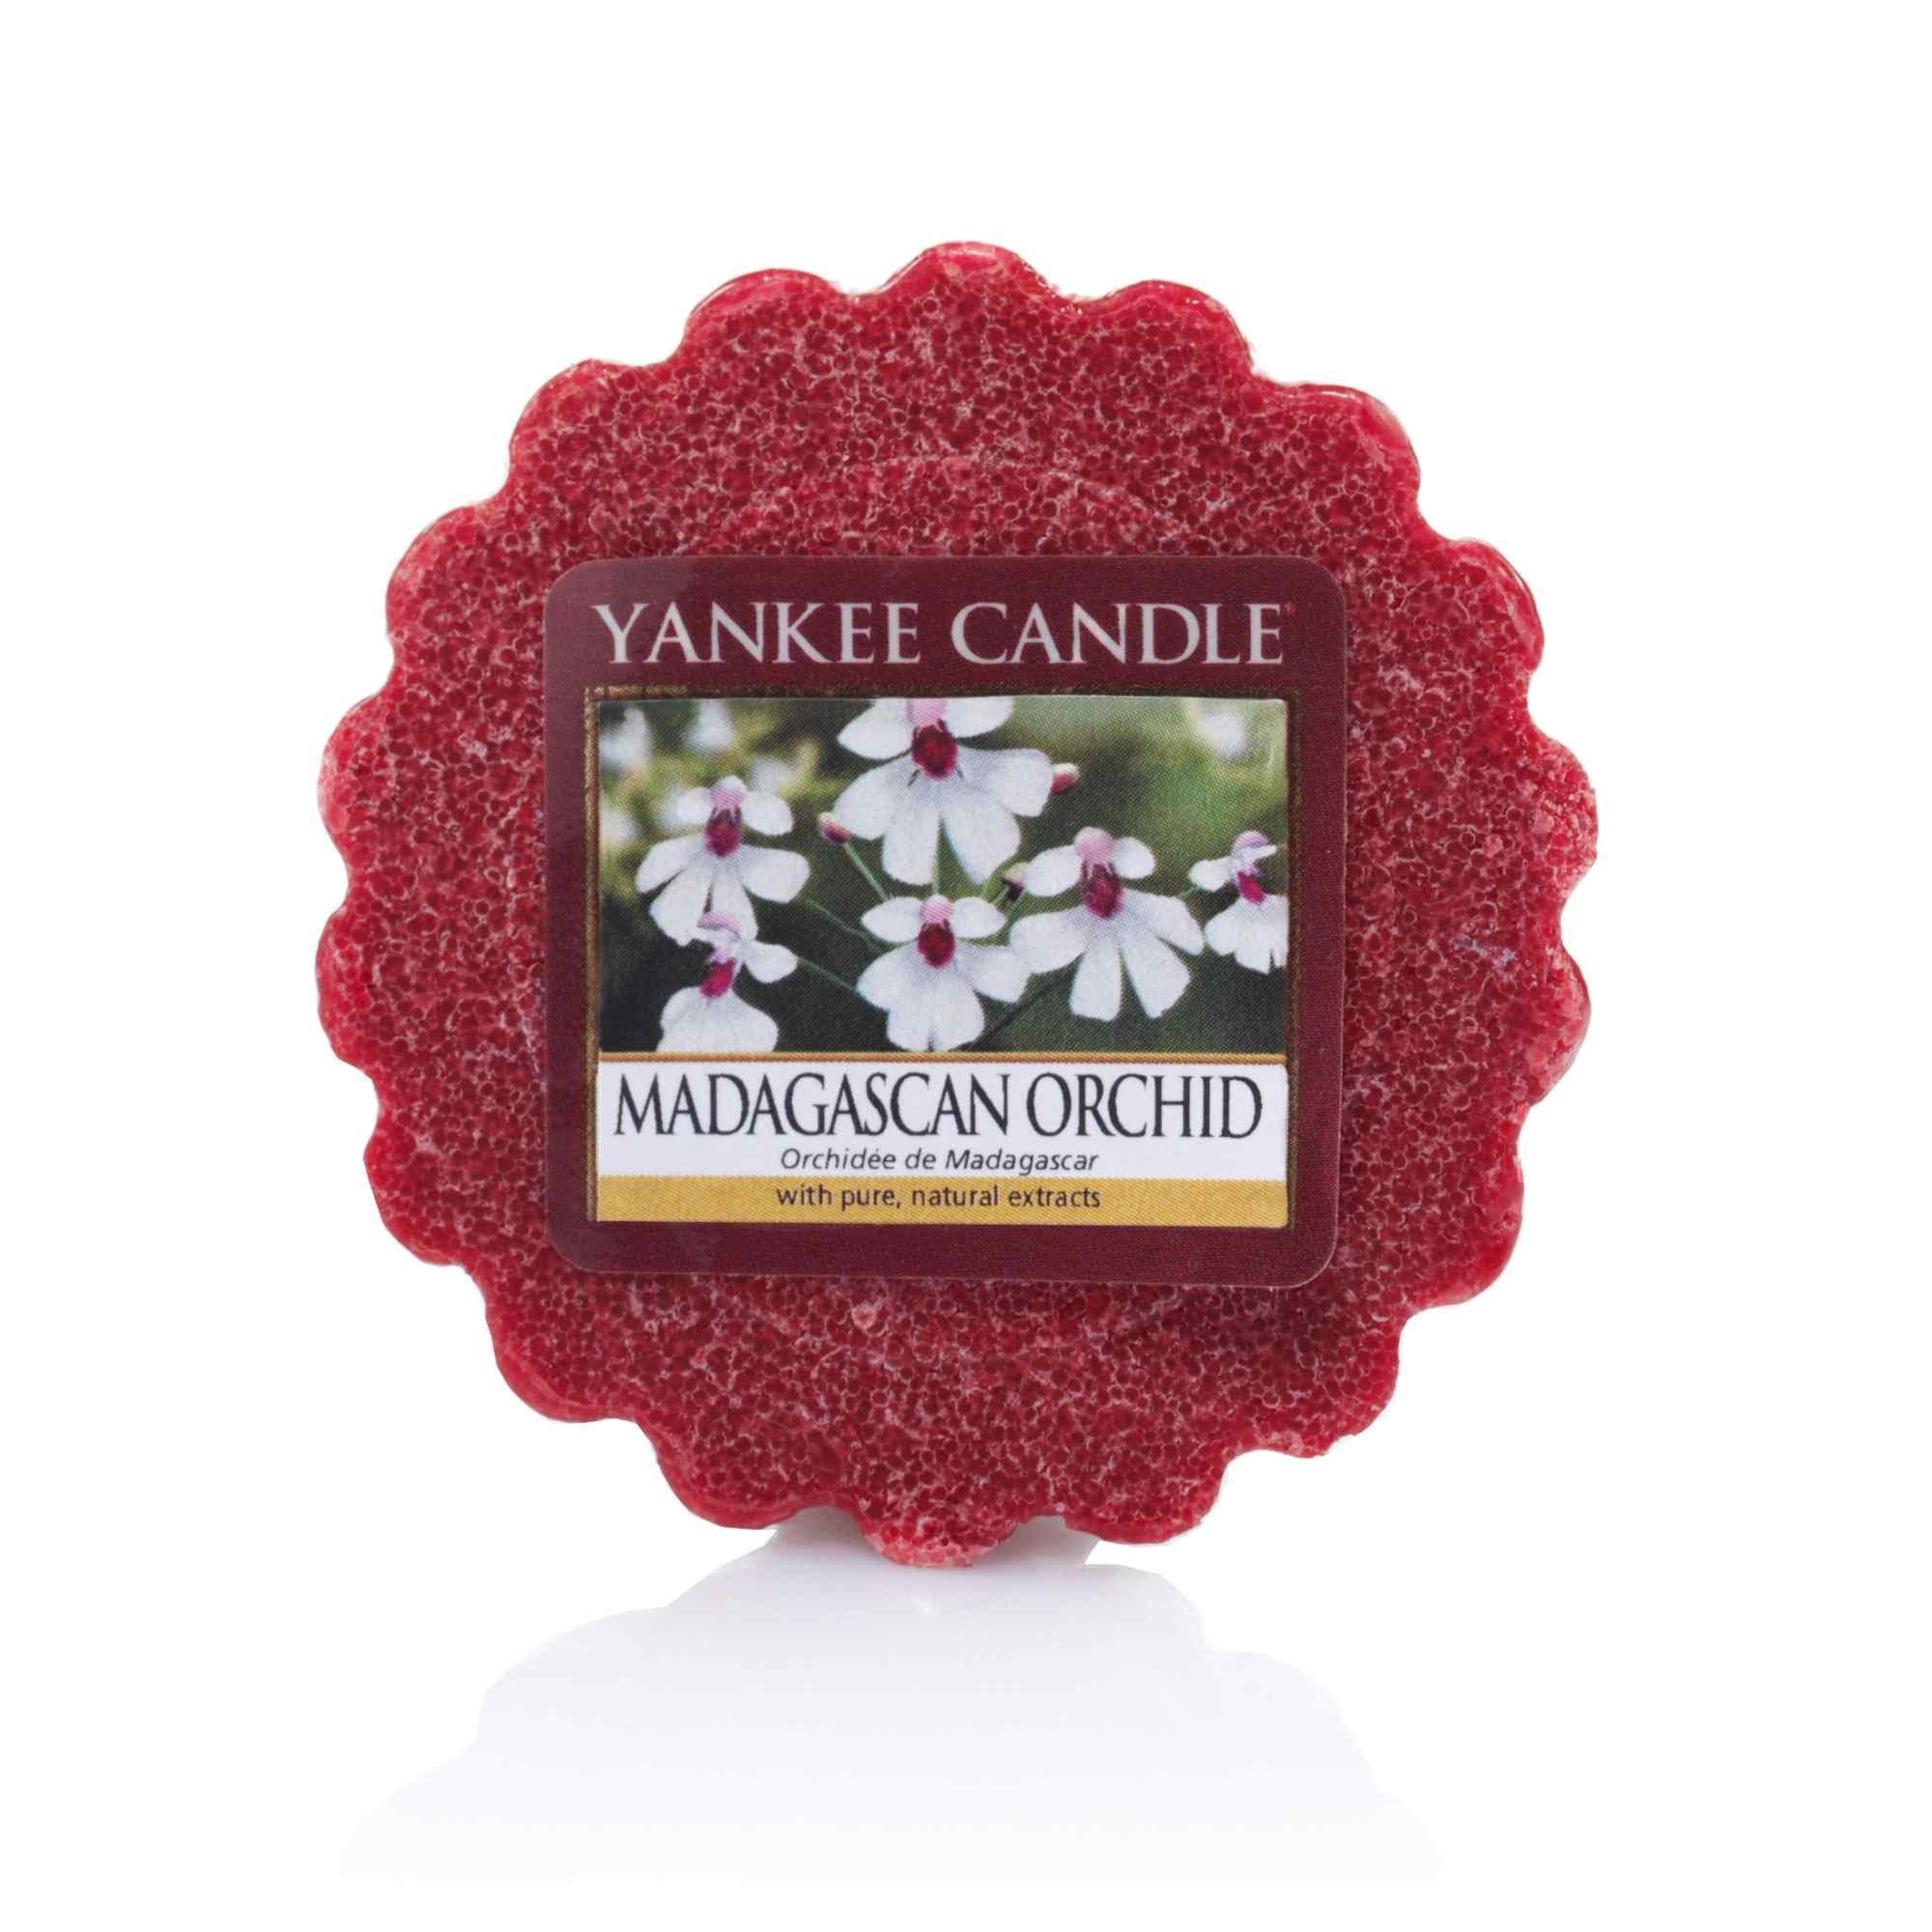 Vonný vosk Yankee Candle Madagascan Orchid 22g